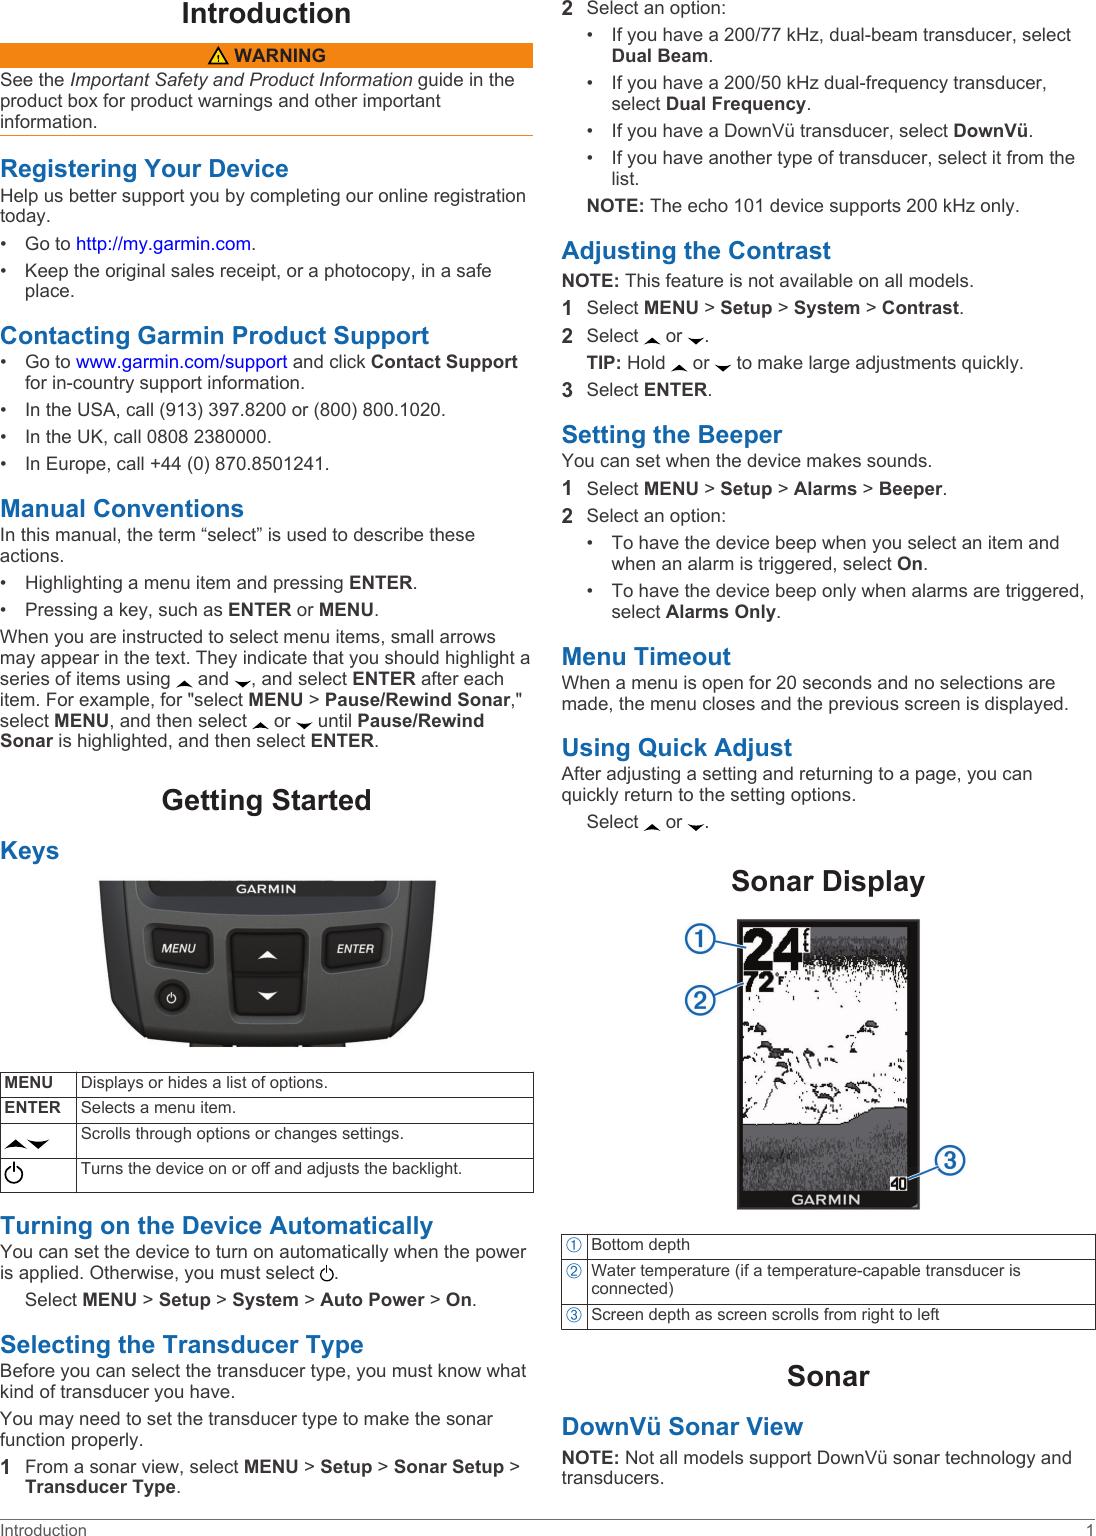 Garmin Echo 101 Owners Manual